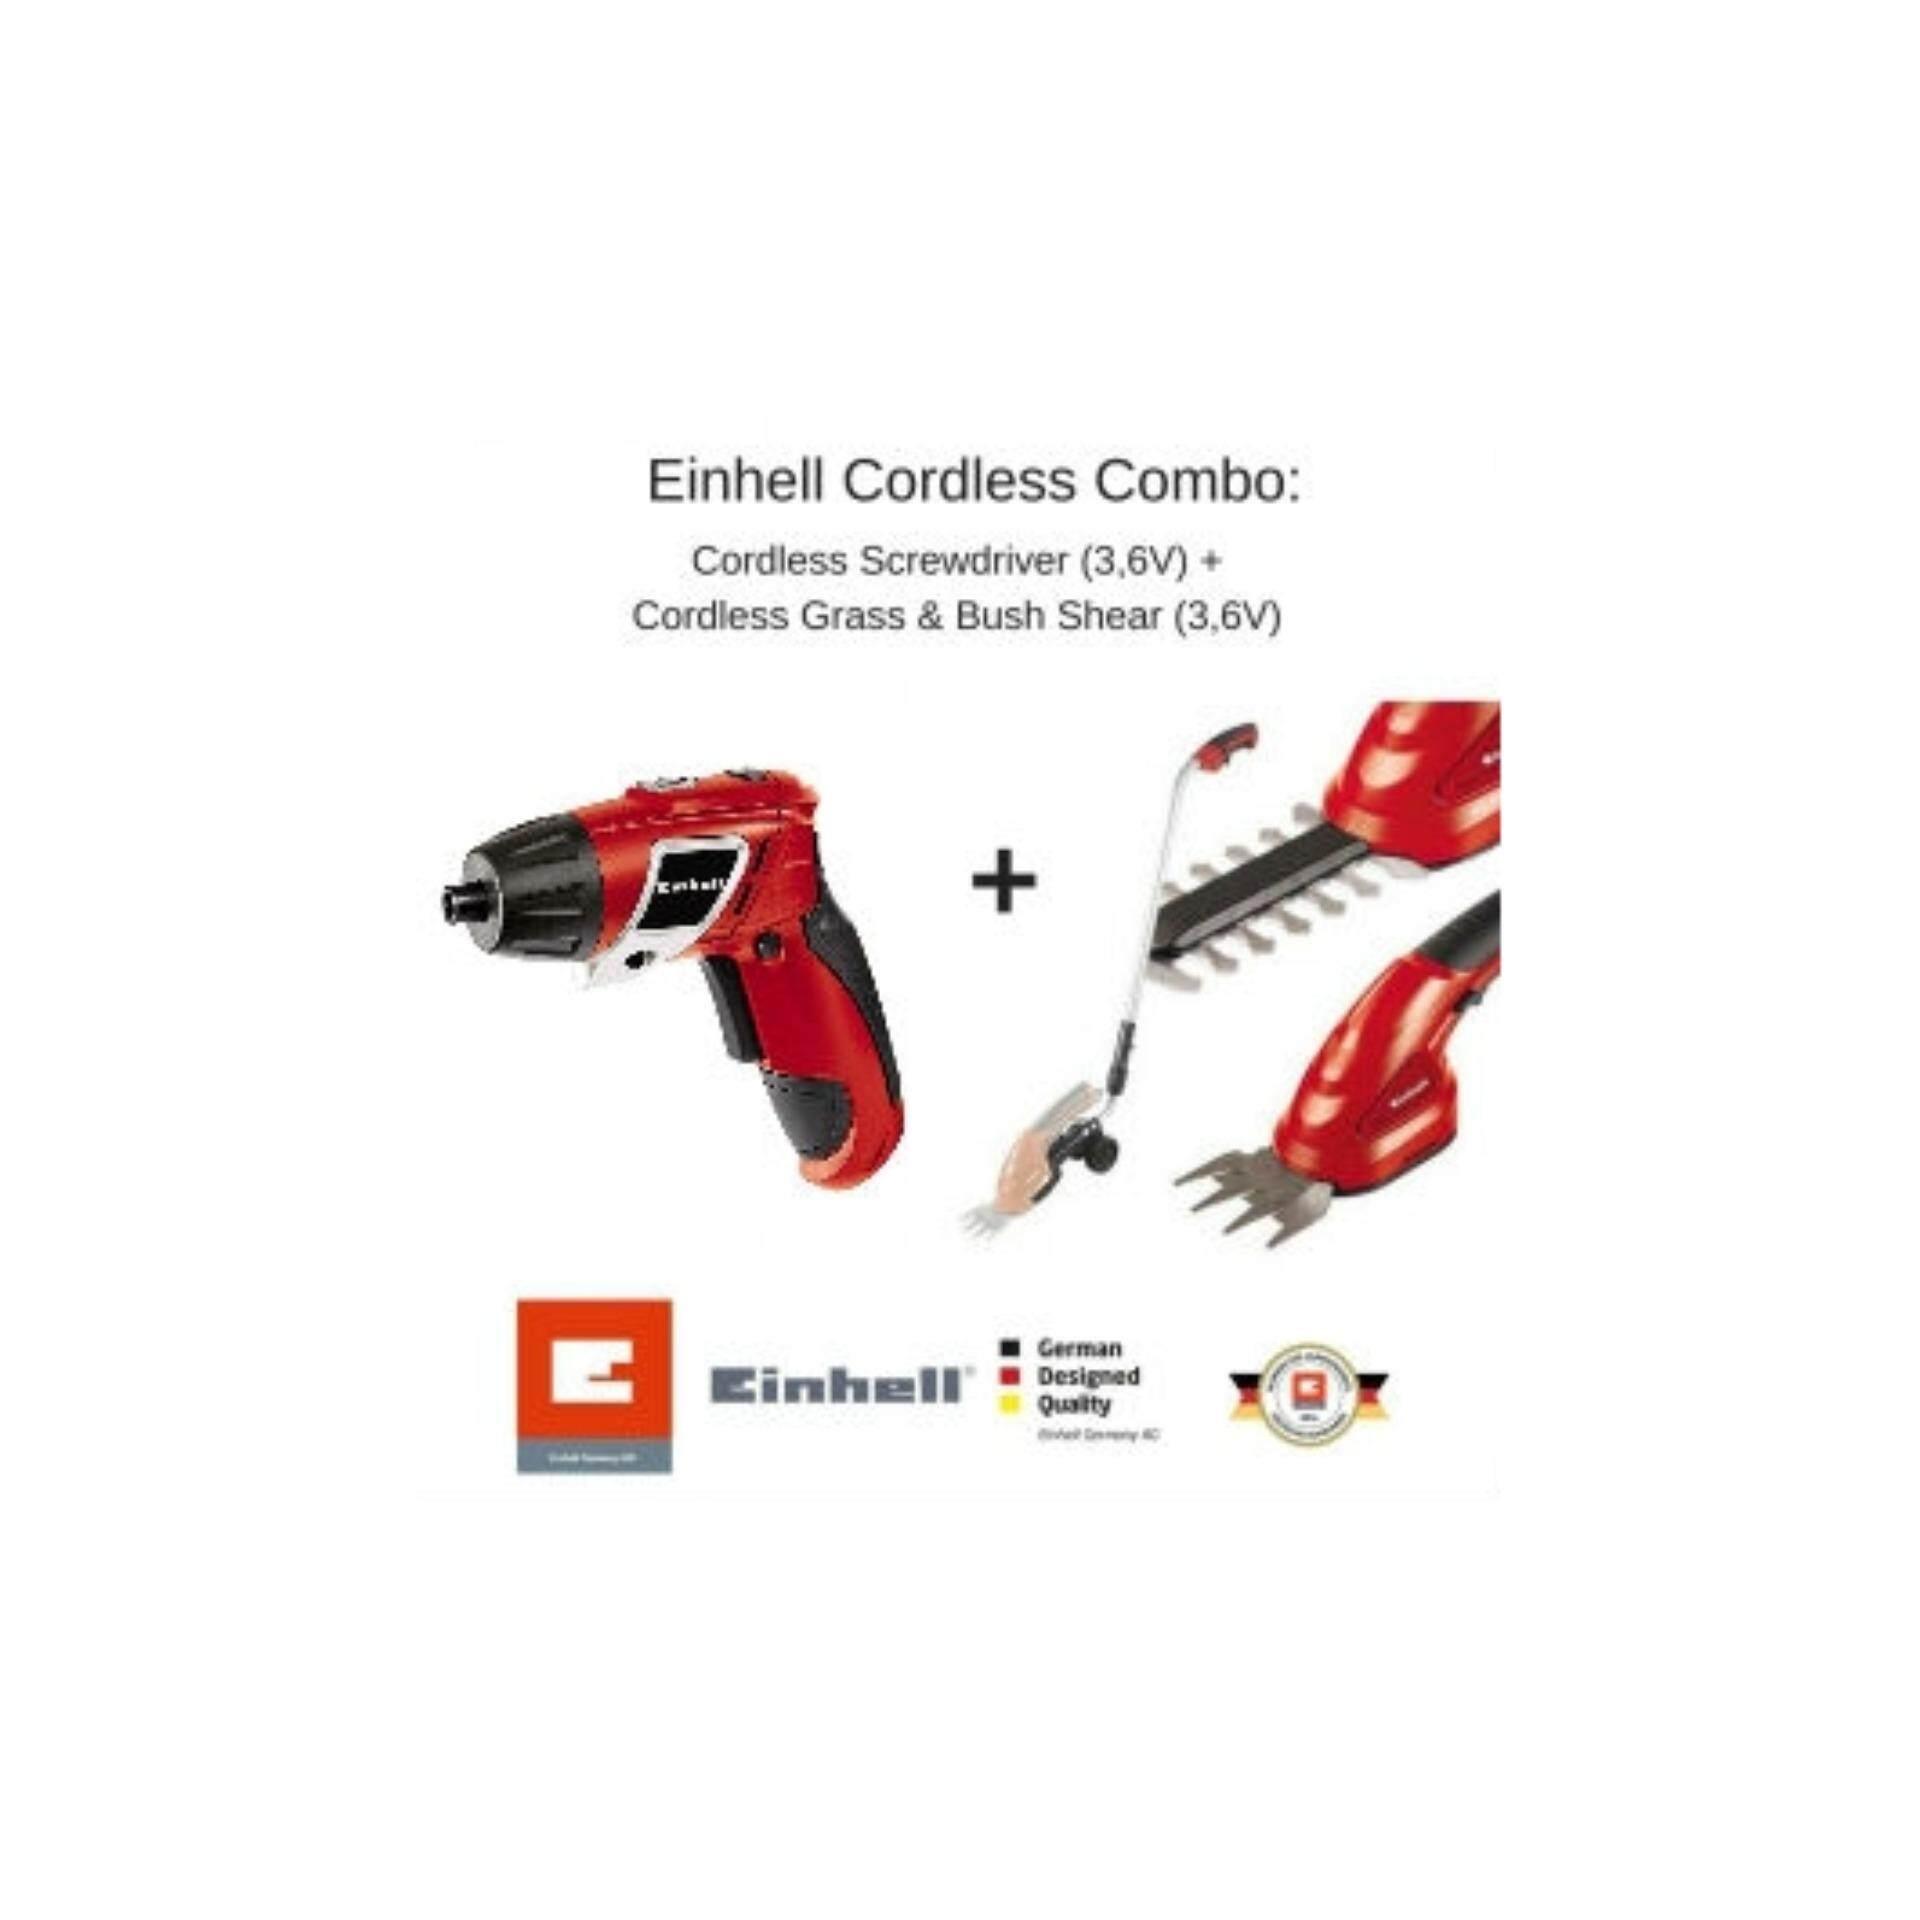 Einhell Cordless Combo : Cordless Scr...